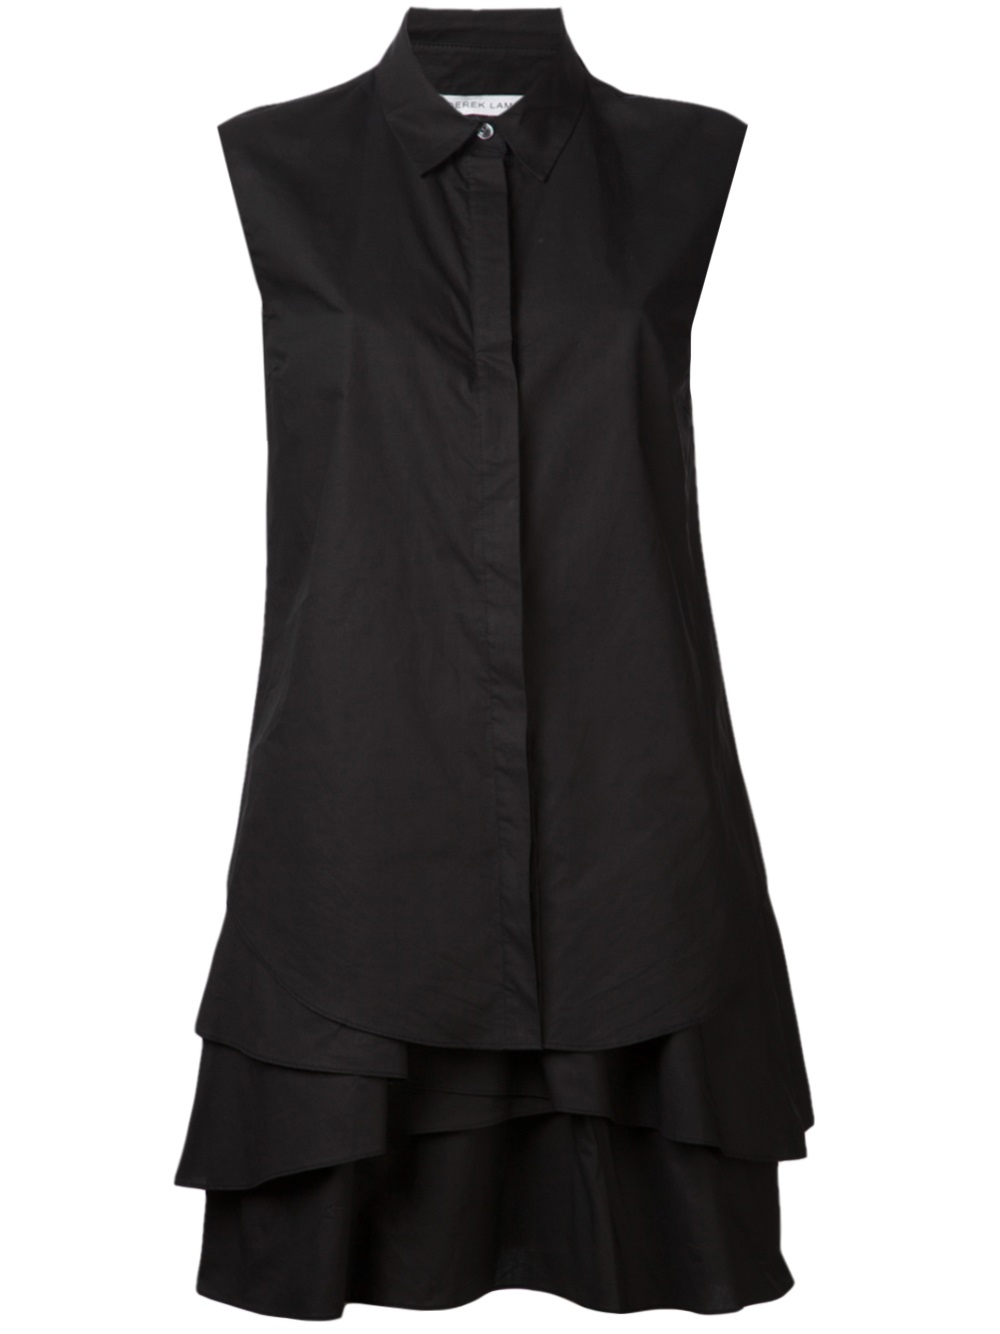 10 Crosby Derek Lam Ruffle Shirt Dress In Black Lyst